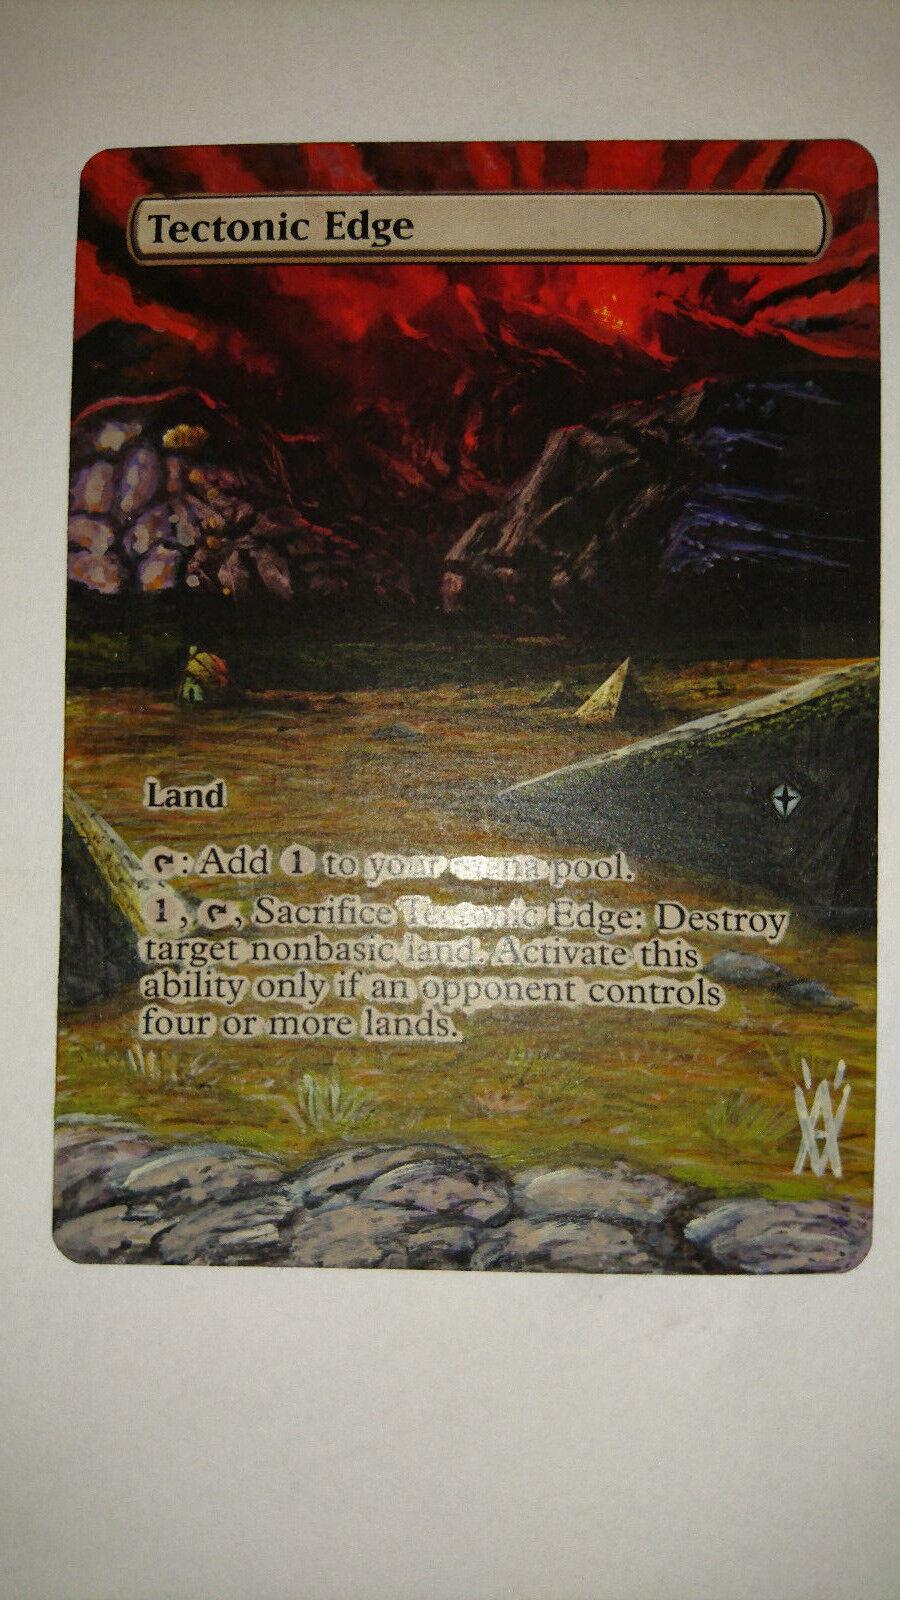 MAGIC TECTONIC EDGE EDGE EDGE FULL ALTERED EXTENDED ART HAND PAINT BY DEMIAN SOLIS 9bb850